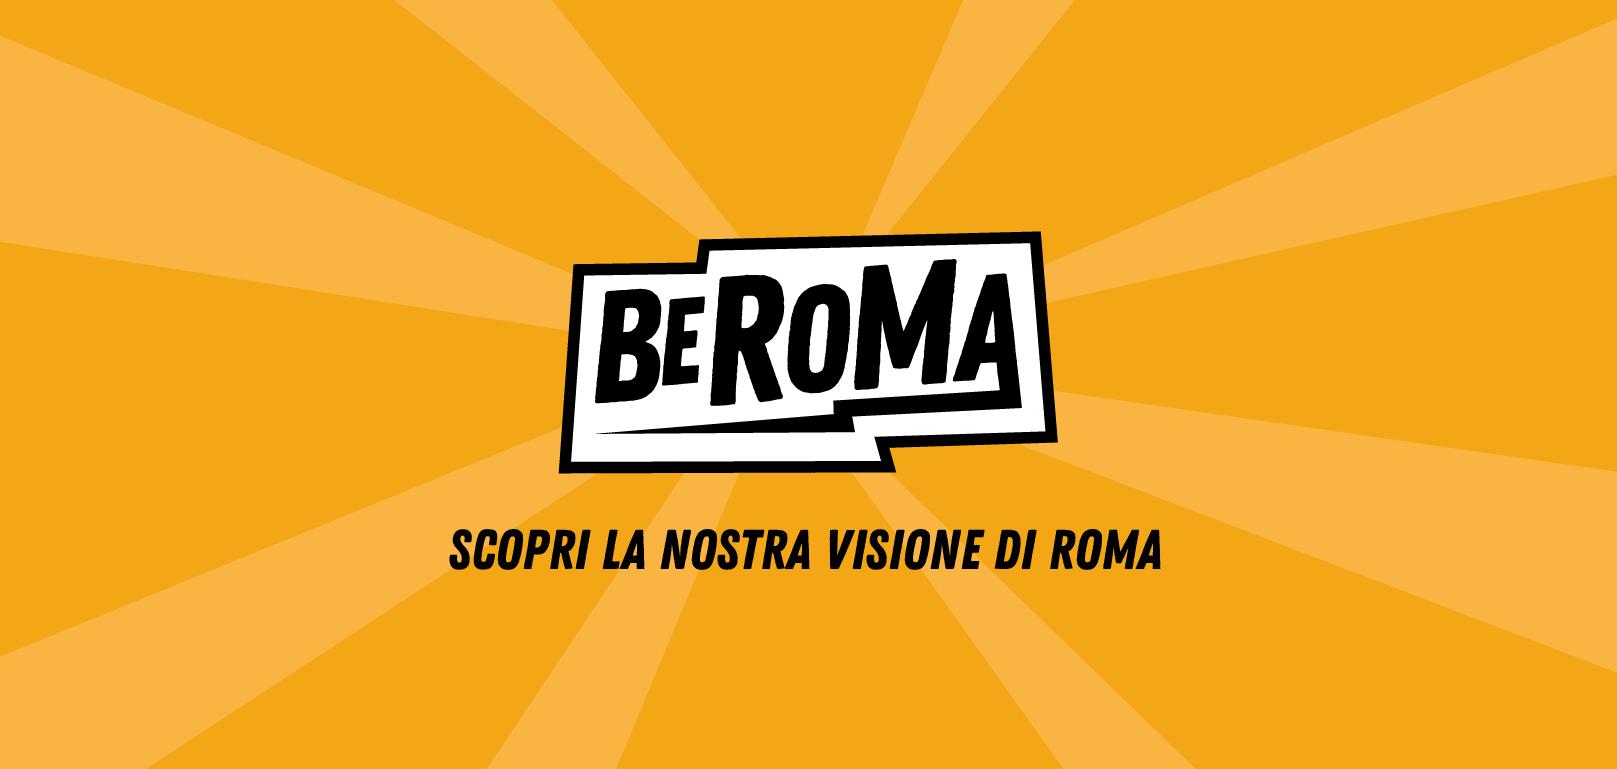 romaid_home_beroma